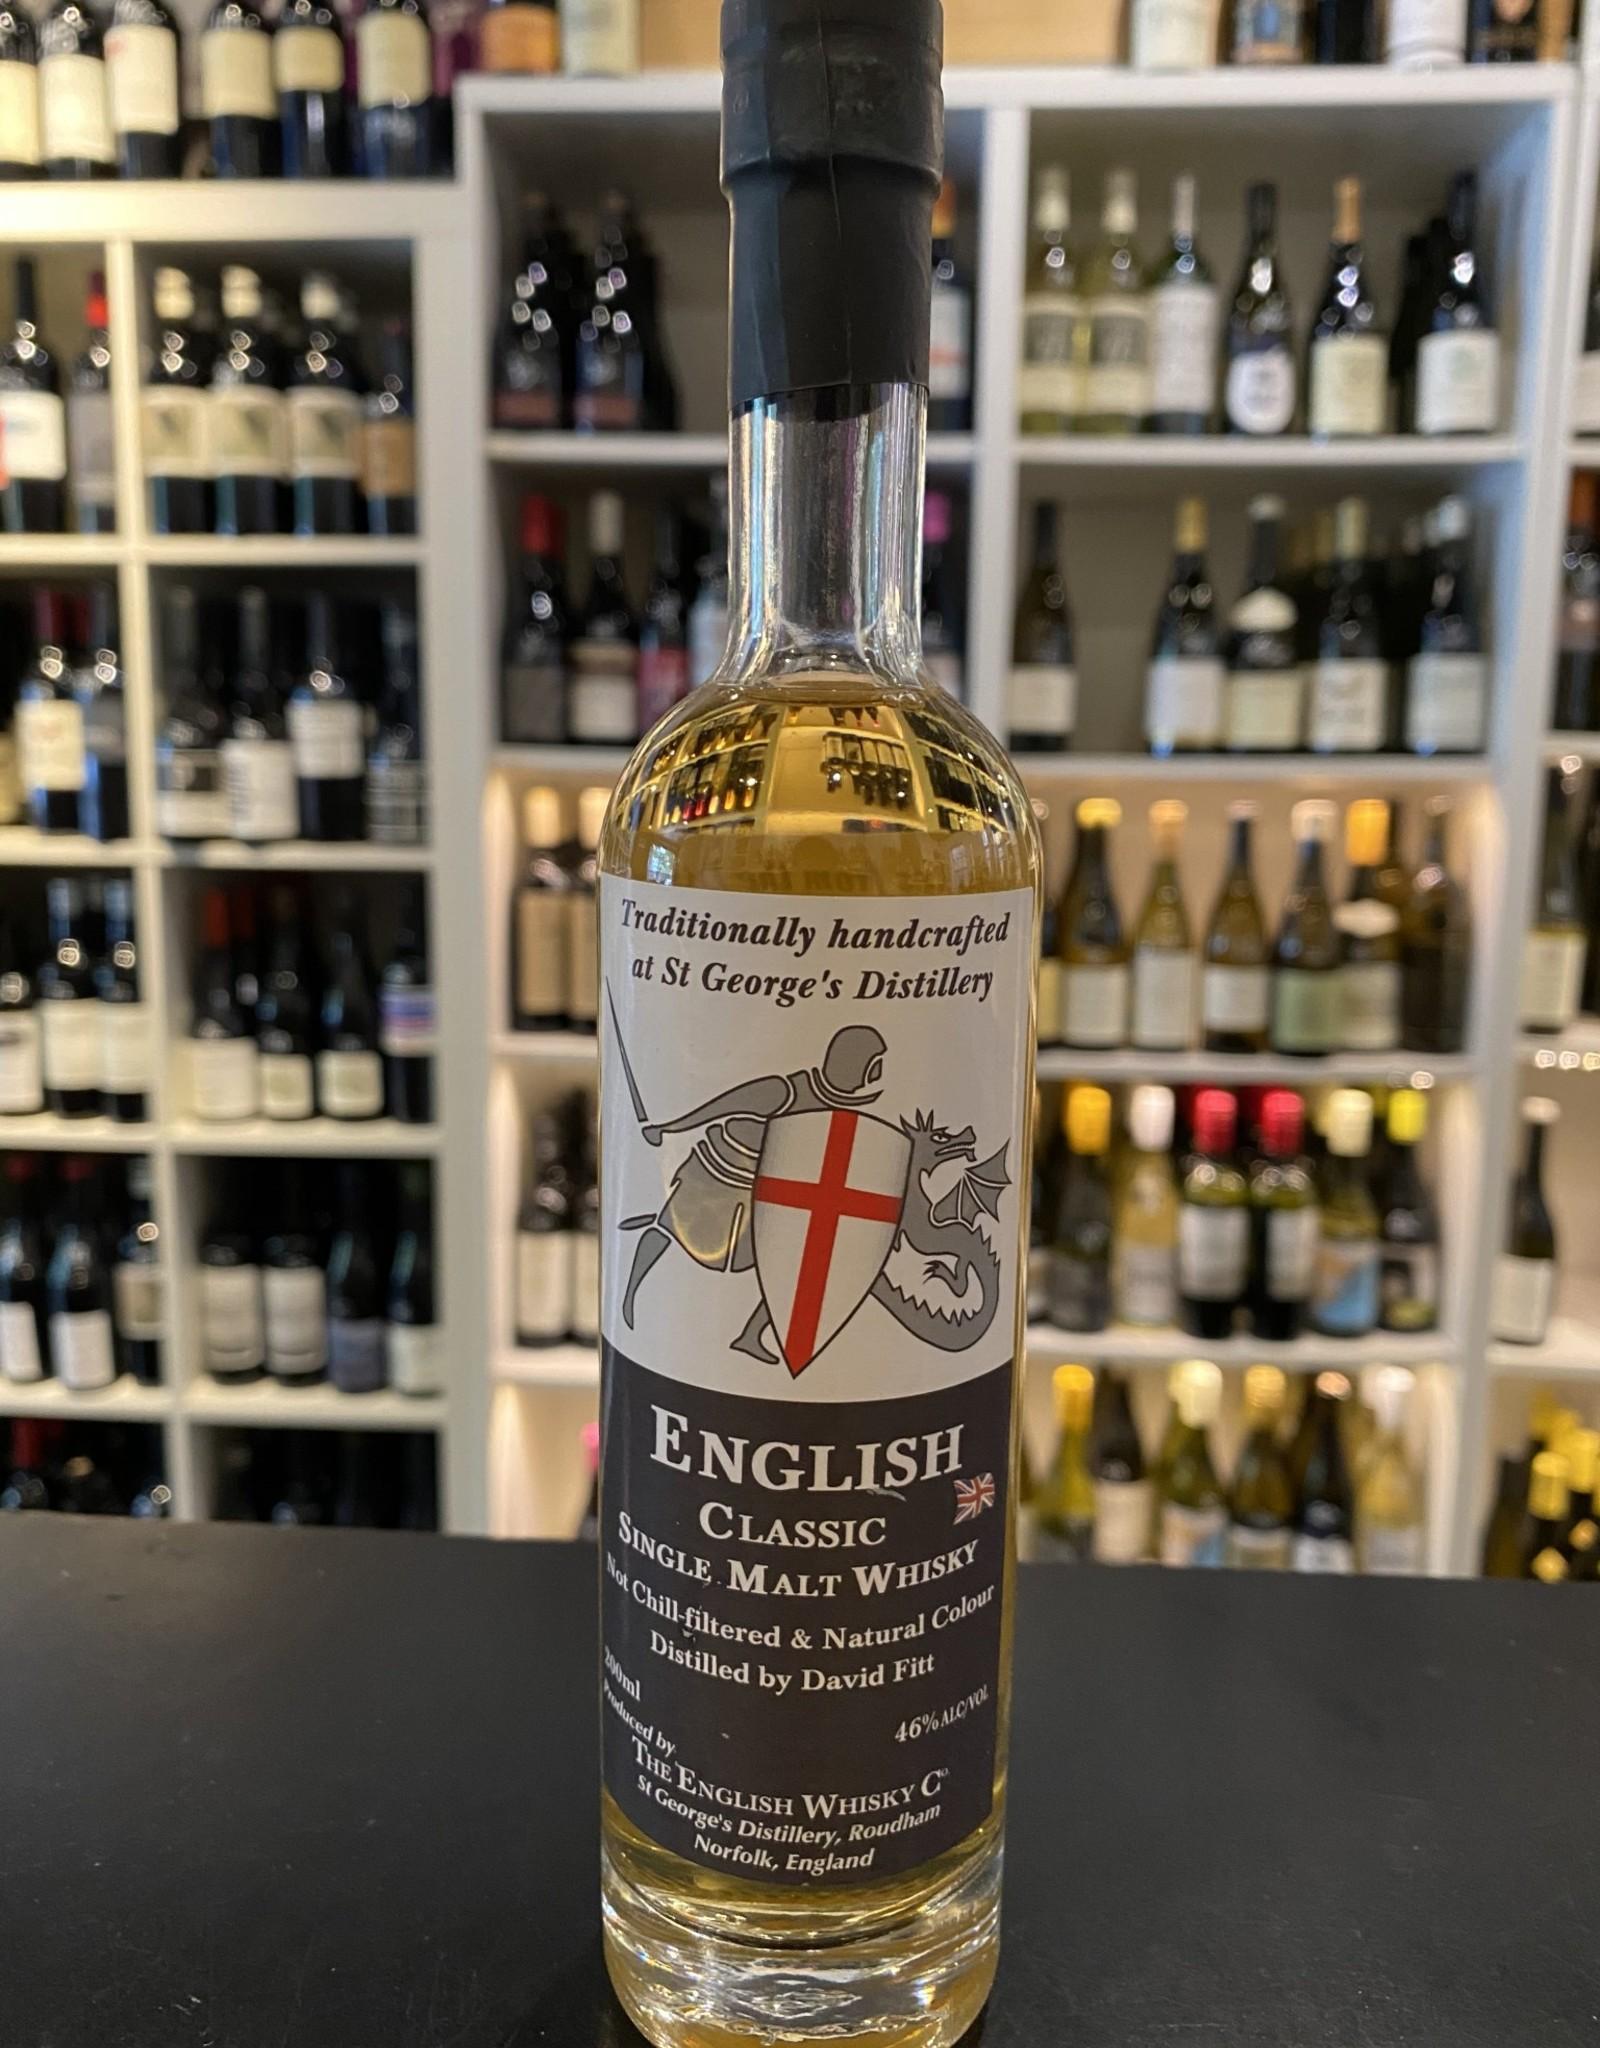 Single Malt Whisky, CLASSIC, English Whisky Company (200 ml)